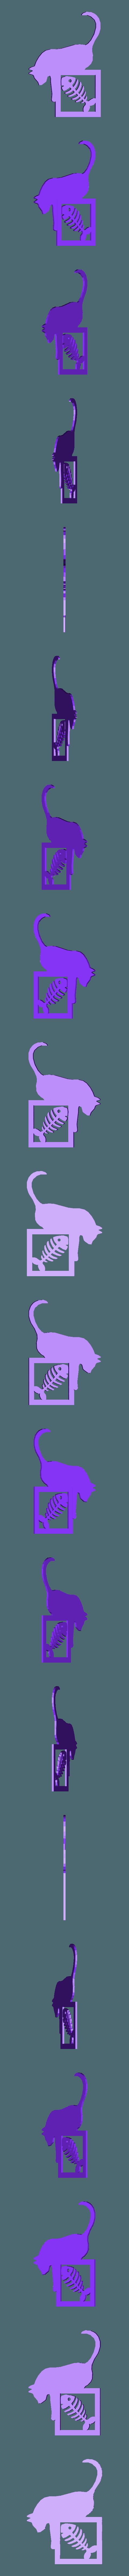 chat poisson descente.stl Download STL file cat pictures • 3D printable model, catf3d